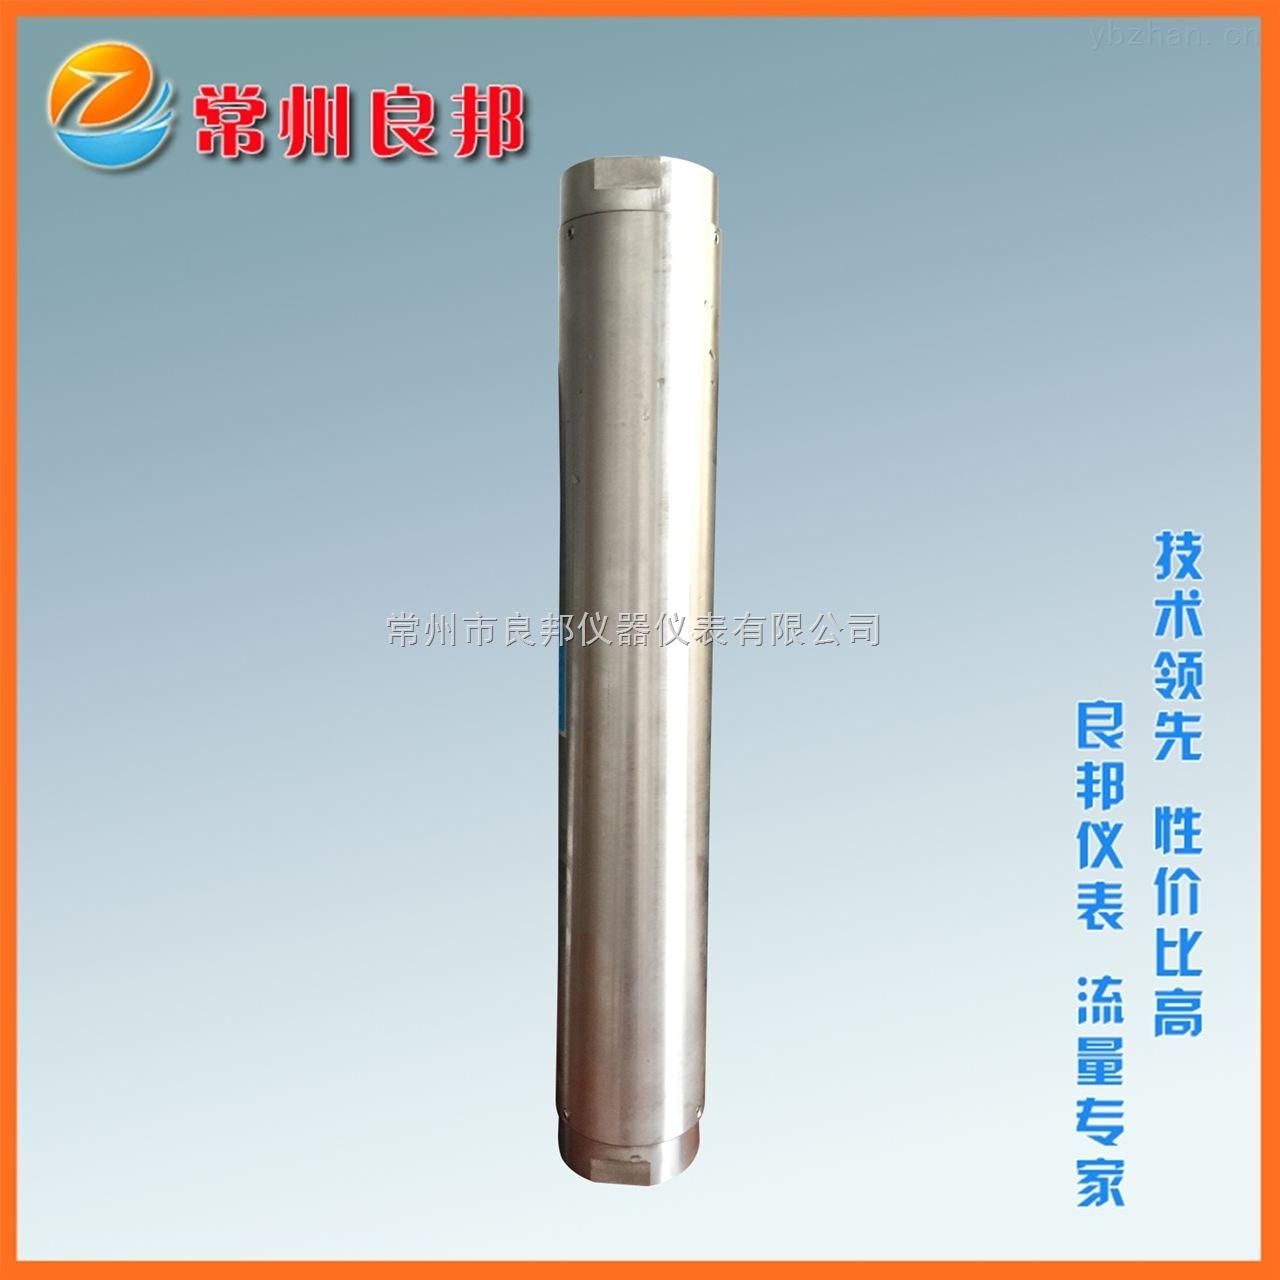 G30S-25-引进ABB技术常州良邦玻璃转子流量计LZB-G30S-25不锈钢外壳 管螺纹连接